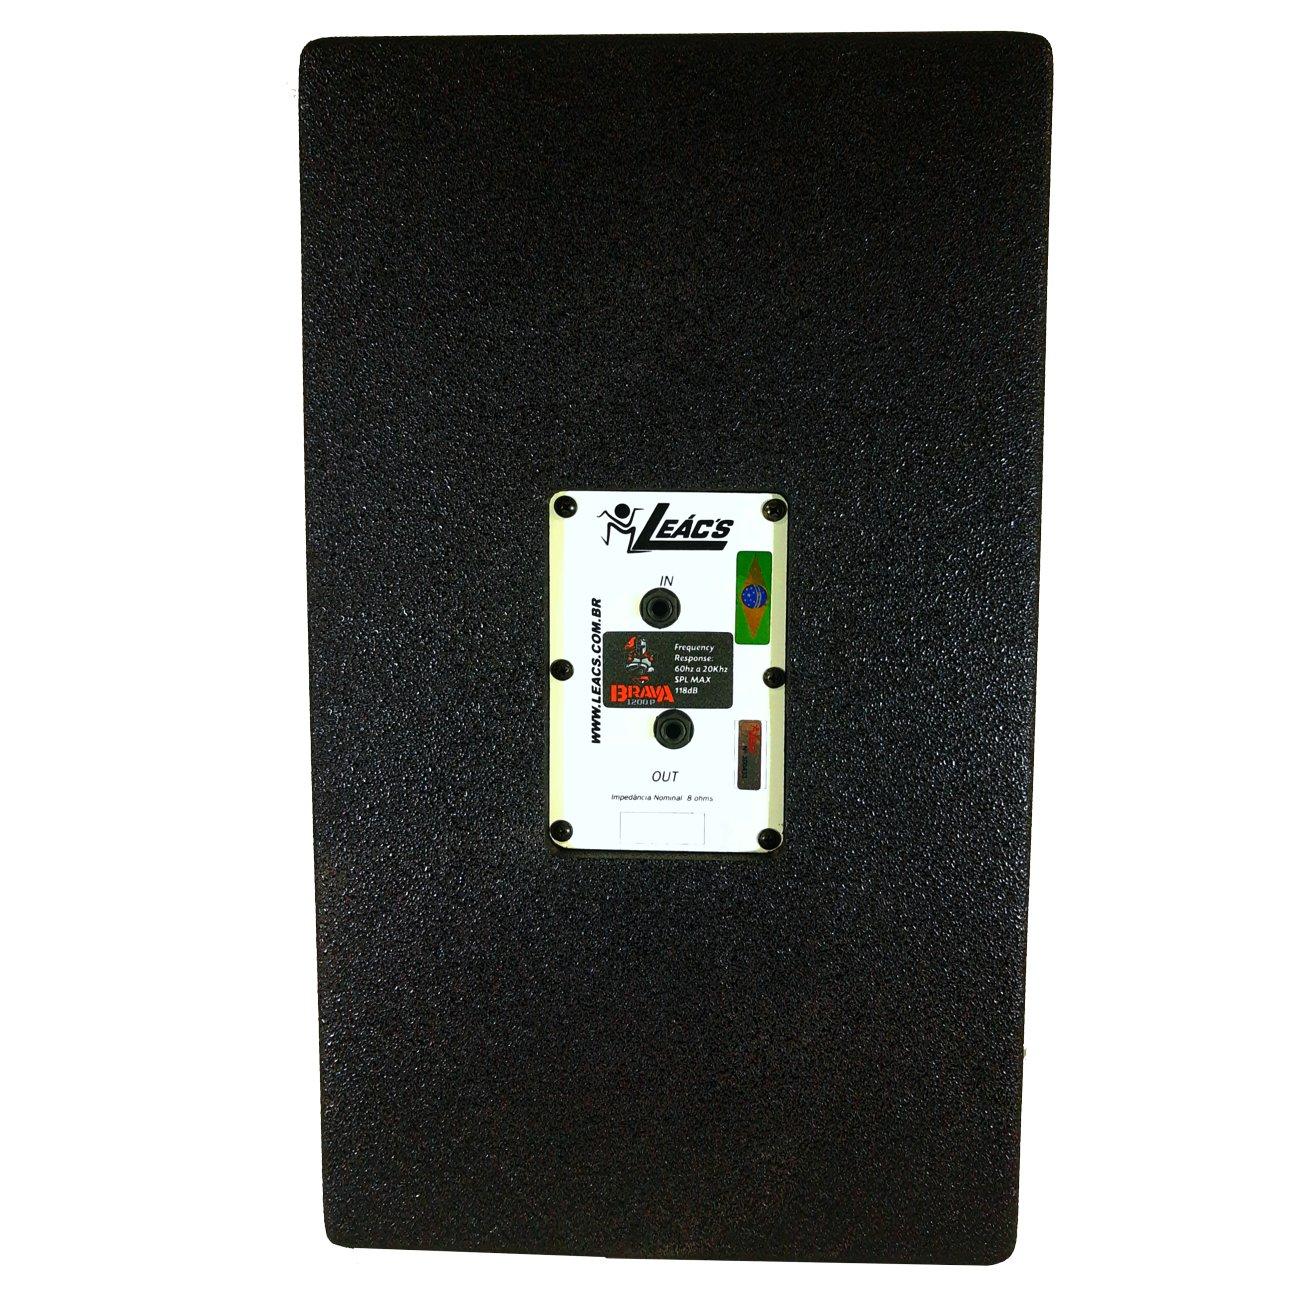 Kit Caixa de Som Ativa Usb + Passiva 12 Leacs Brava 1200 400w Rms